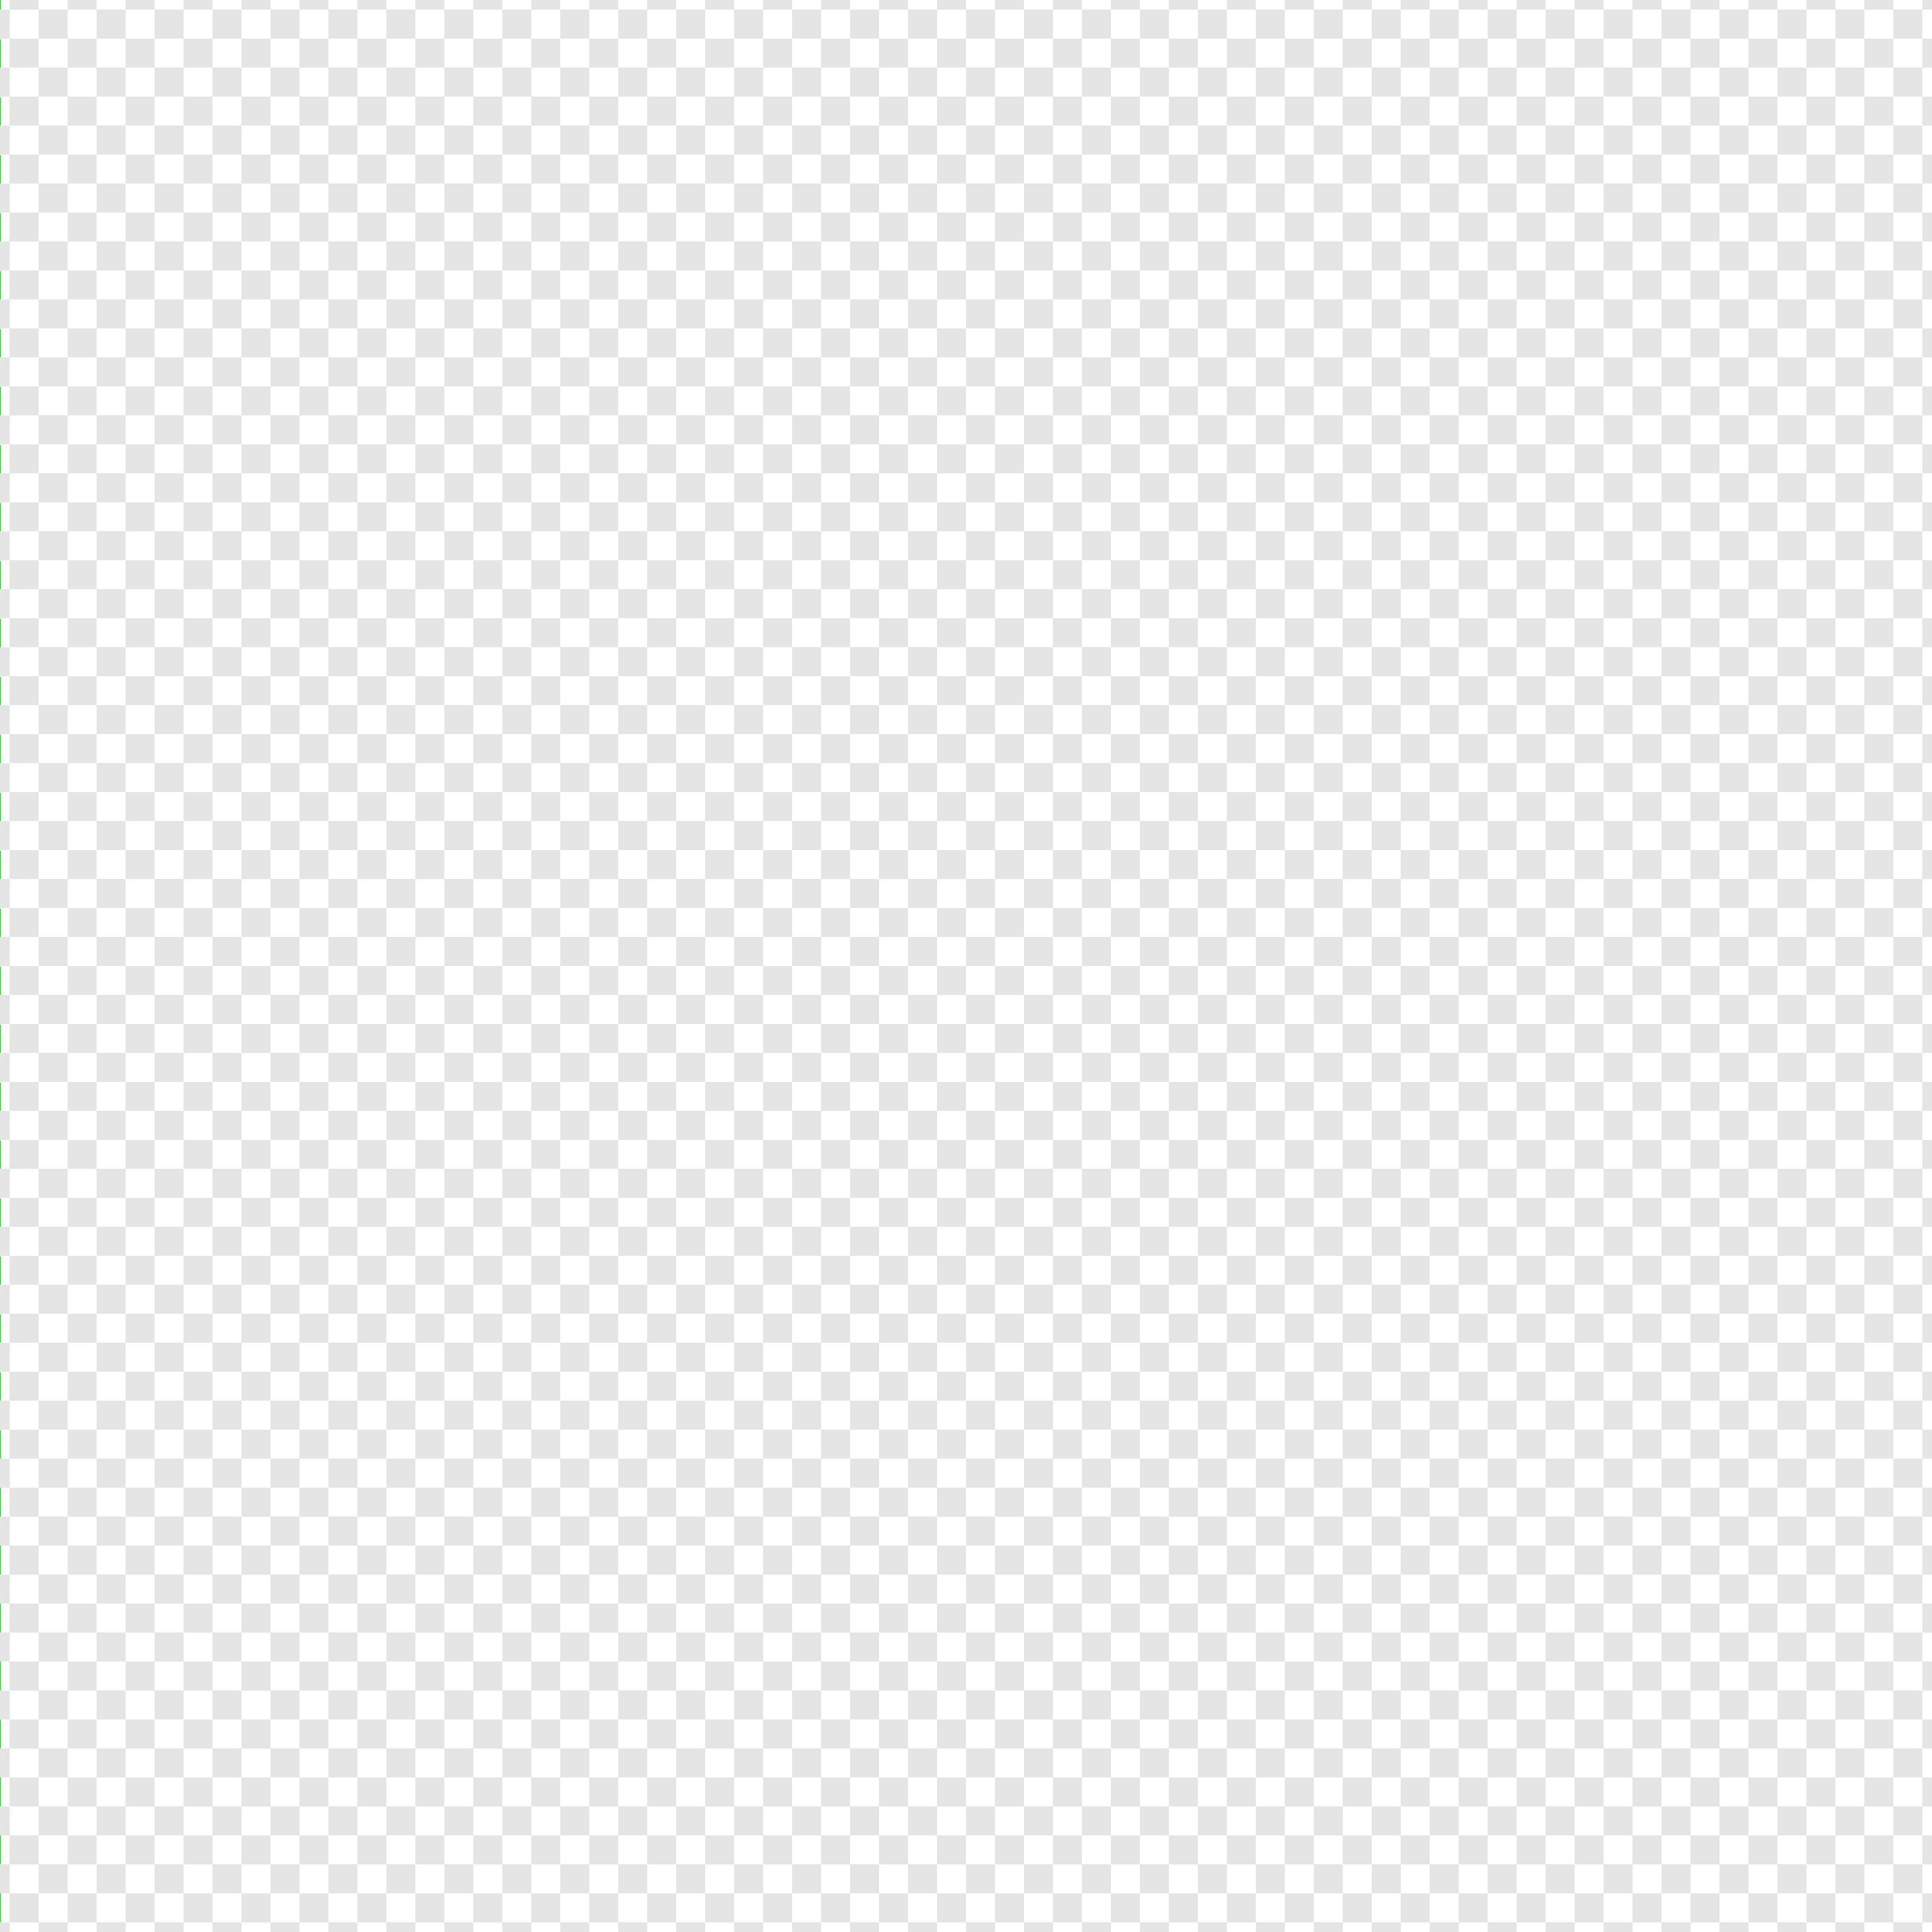 gop elephant transparent background border Icons PNG   PNG 2400x2400